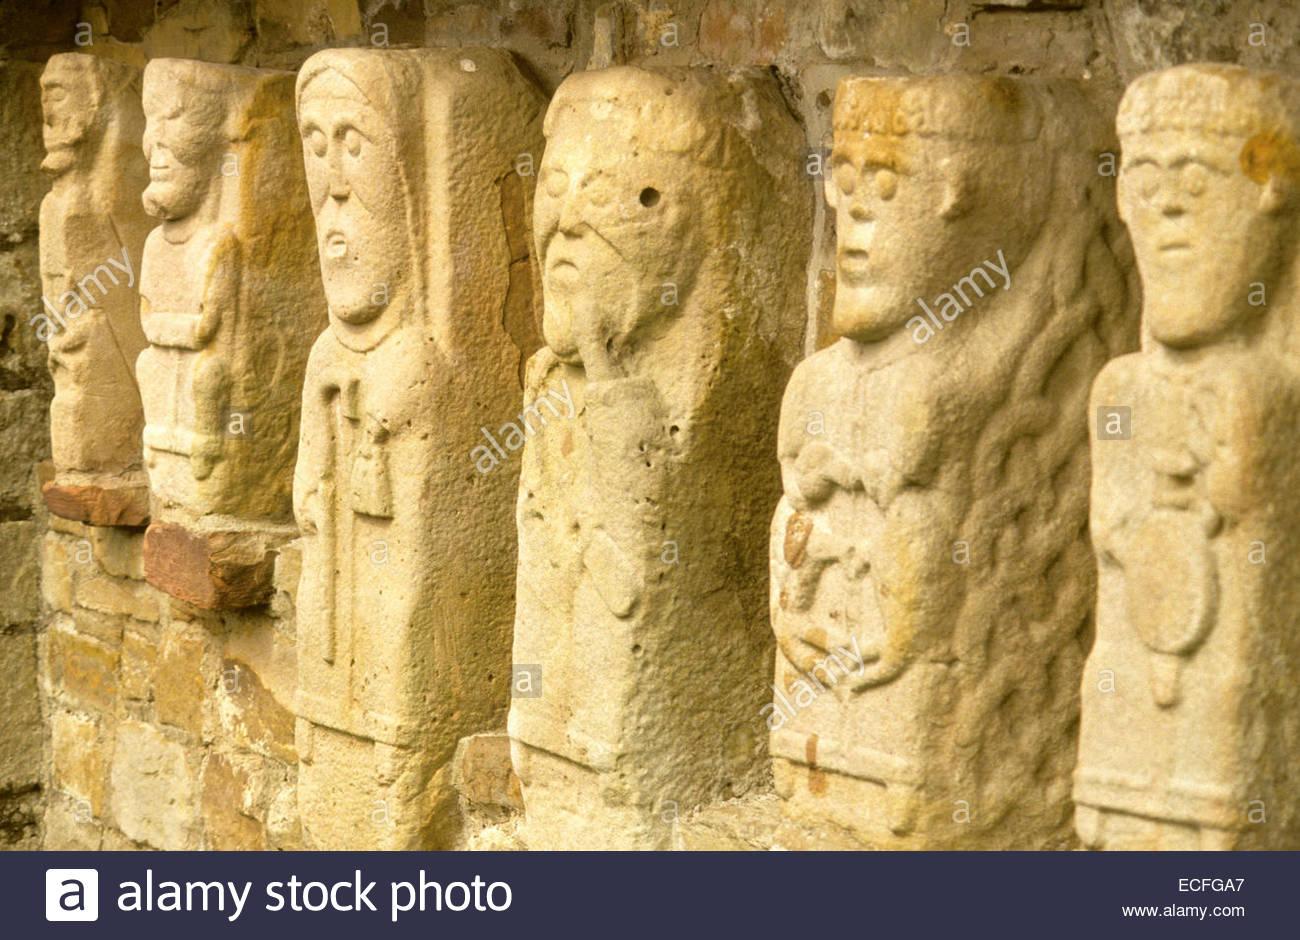 Northern Ireland, celtic statues - Stock Image